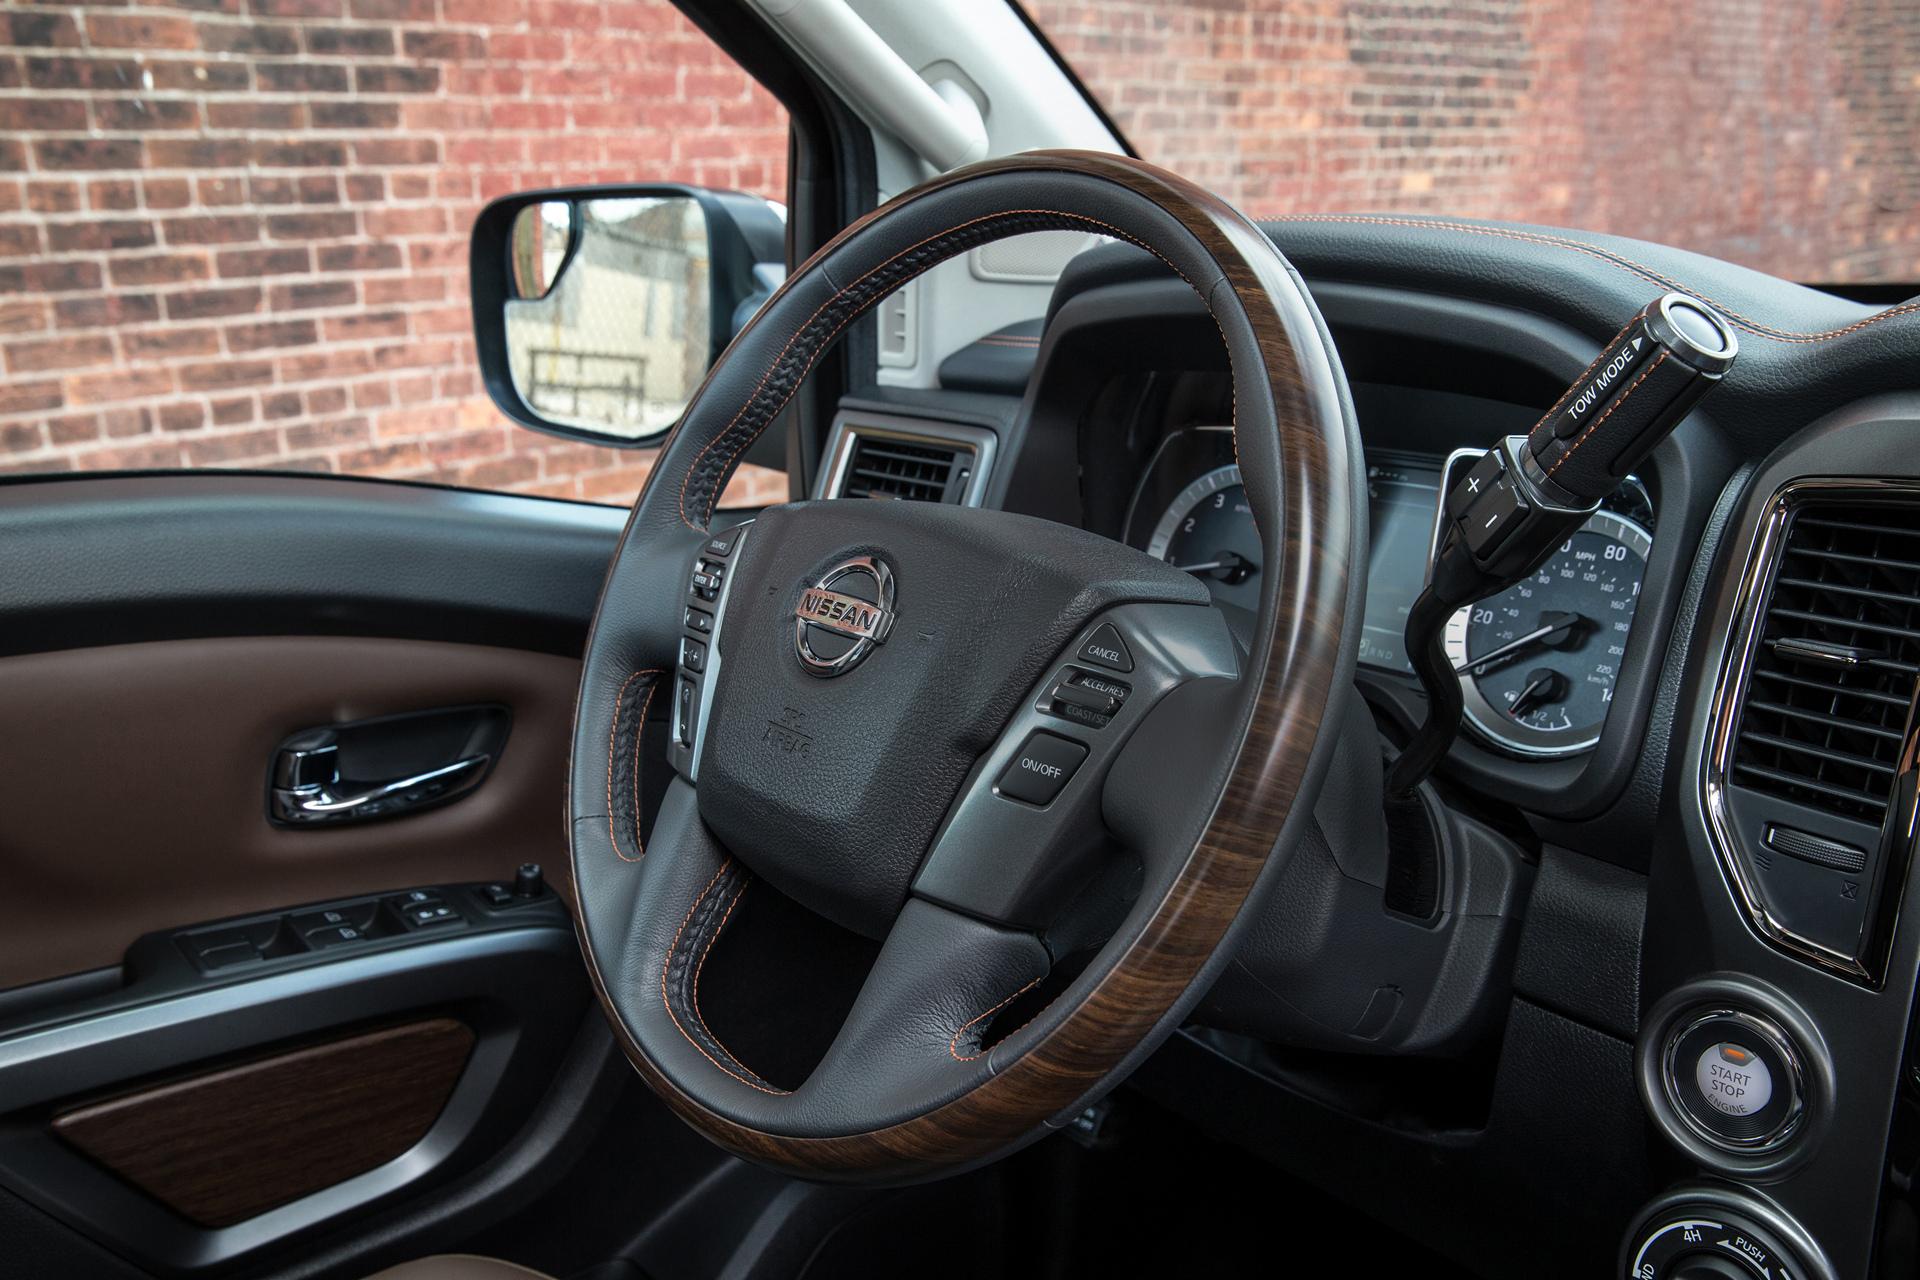 2017 Nissan TITAN Crew Cab © Nissan Motor Co., Ltd.